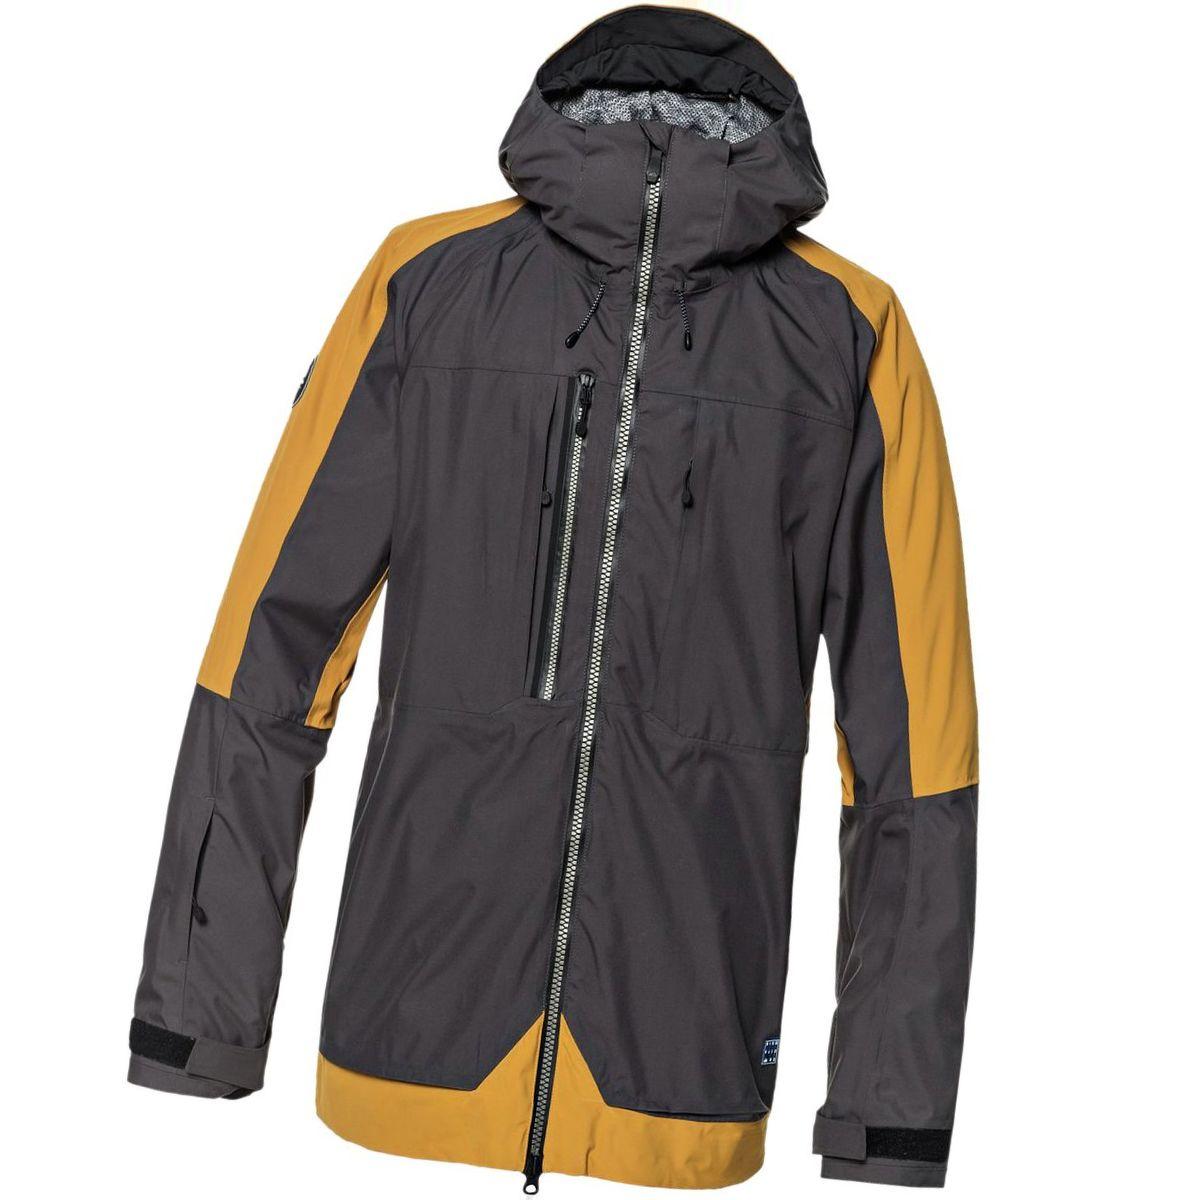 Quiksilver Travis Rice Stretch Hooded Jacket - Men's